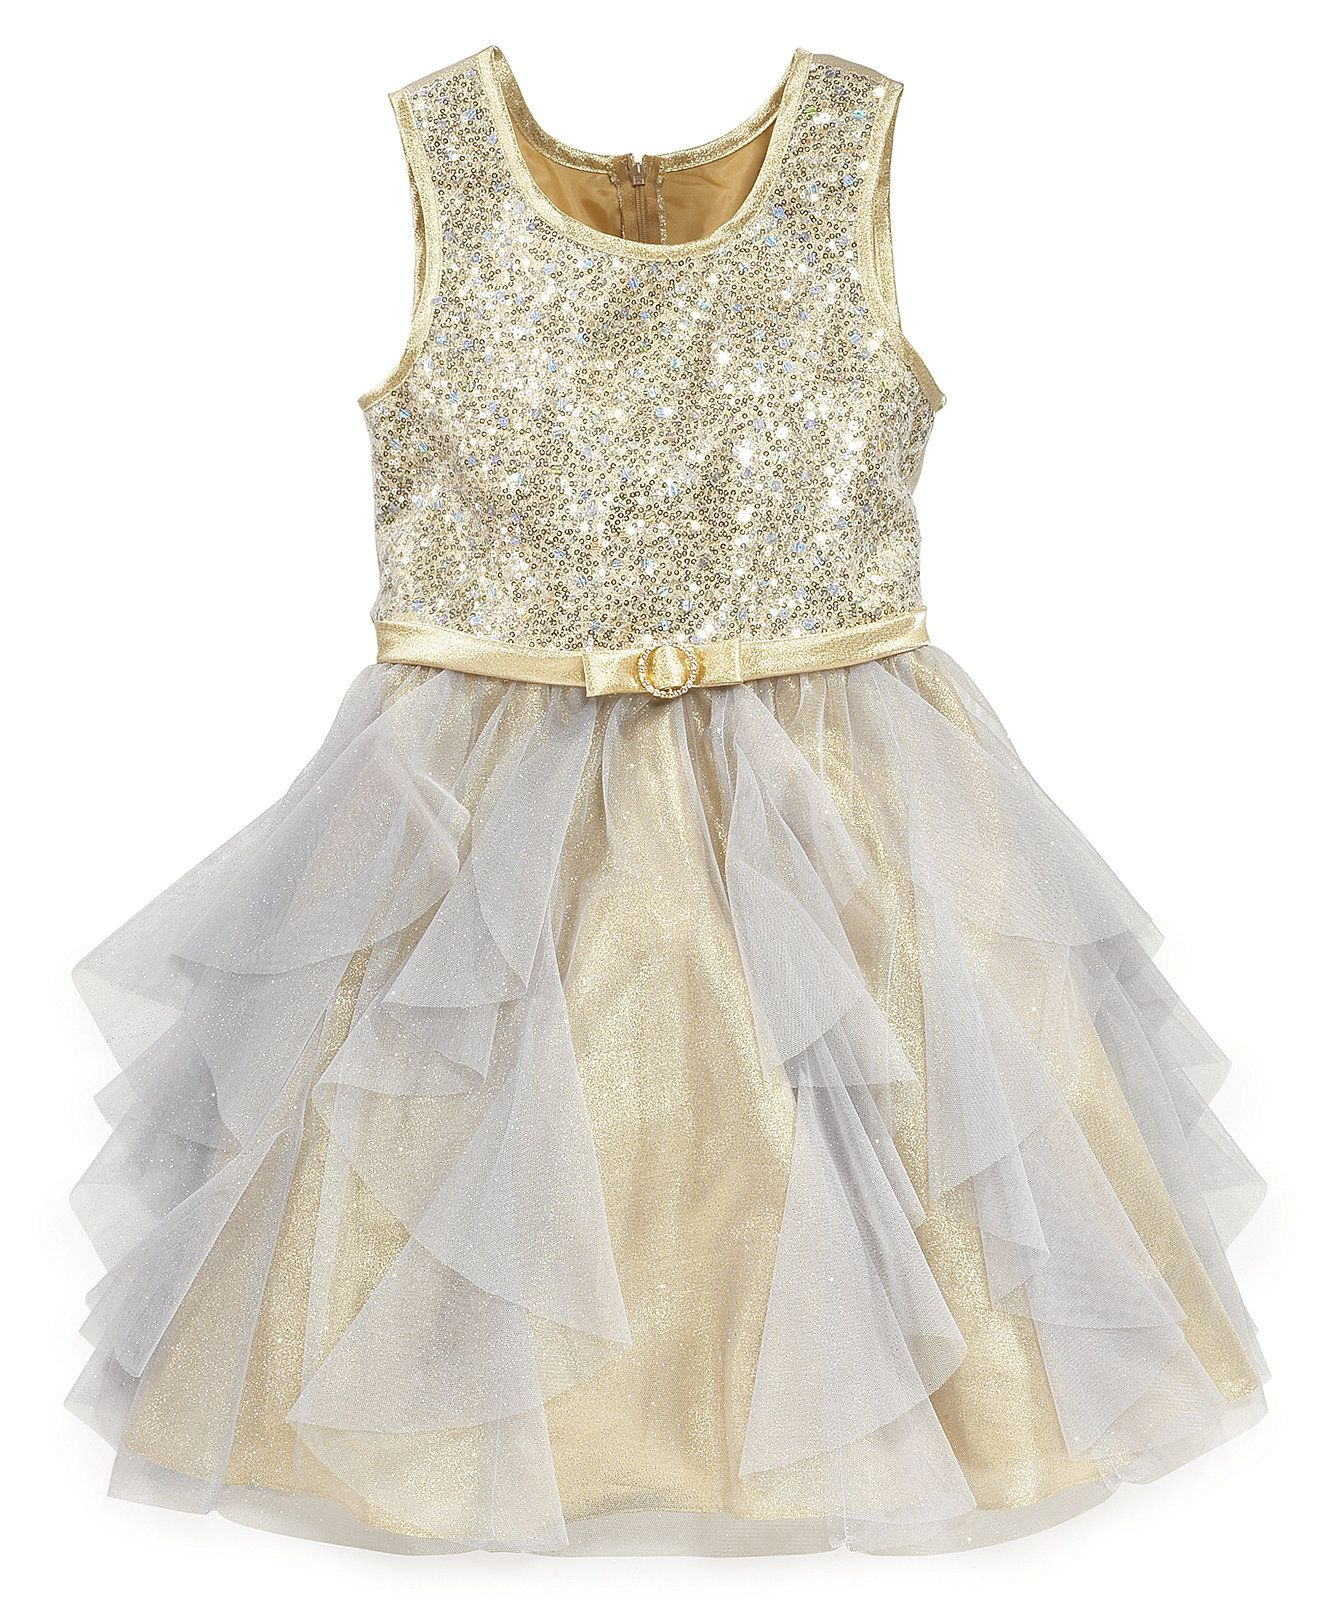 Bonnie Jean Girls Dress, Girls Sequin Glitter Tulle Dress - Kids Girls Dresses - Macy's